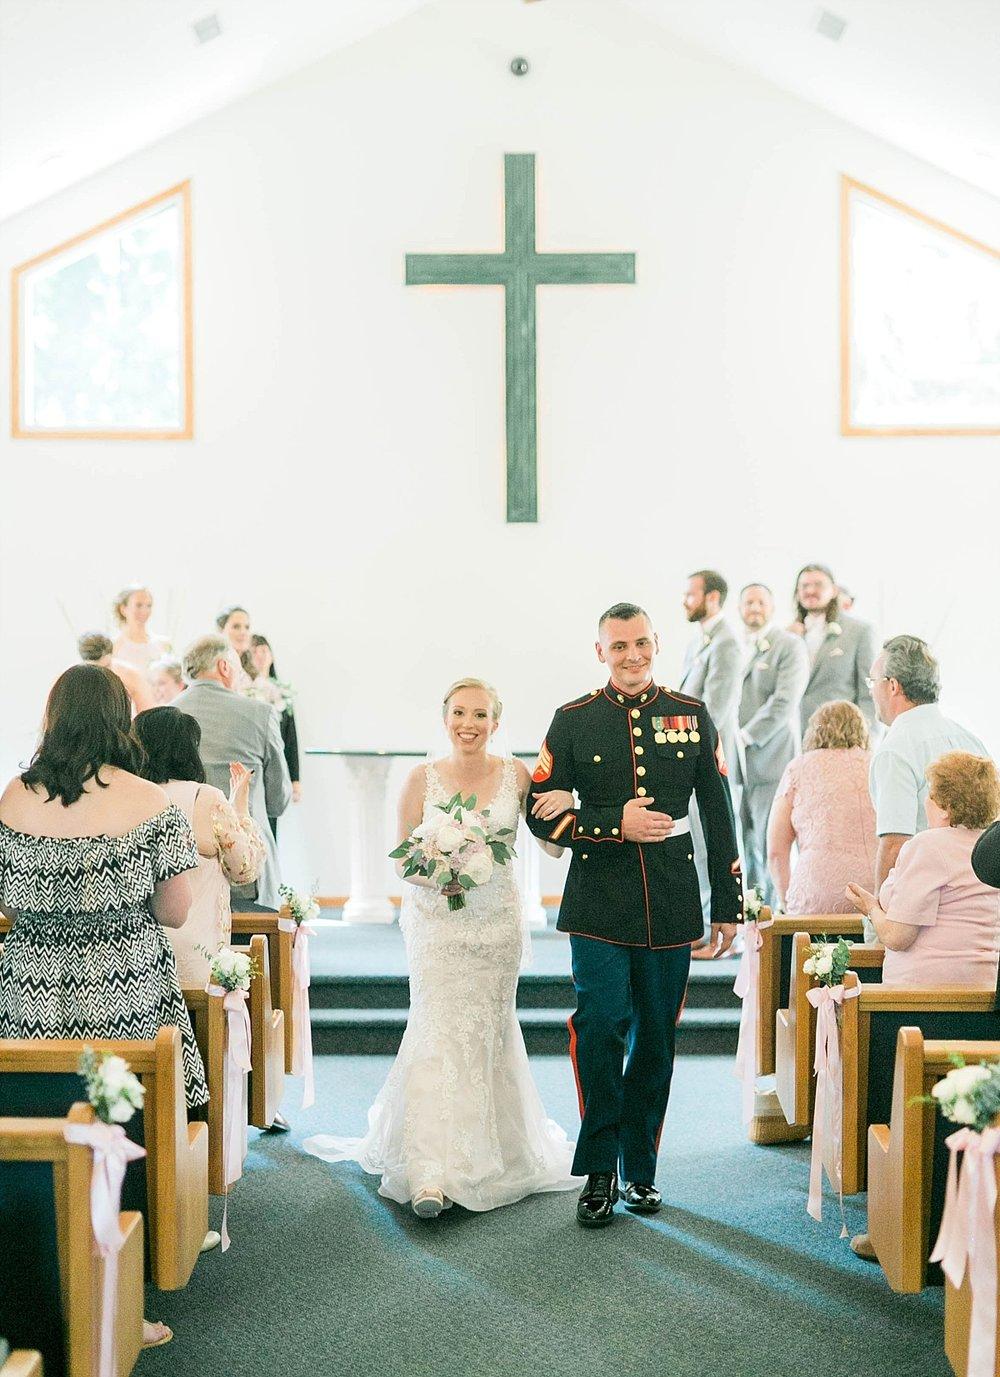 miriam bulcher photography tanglewood hills wedding